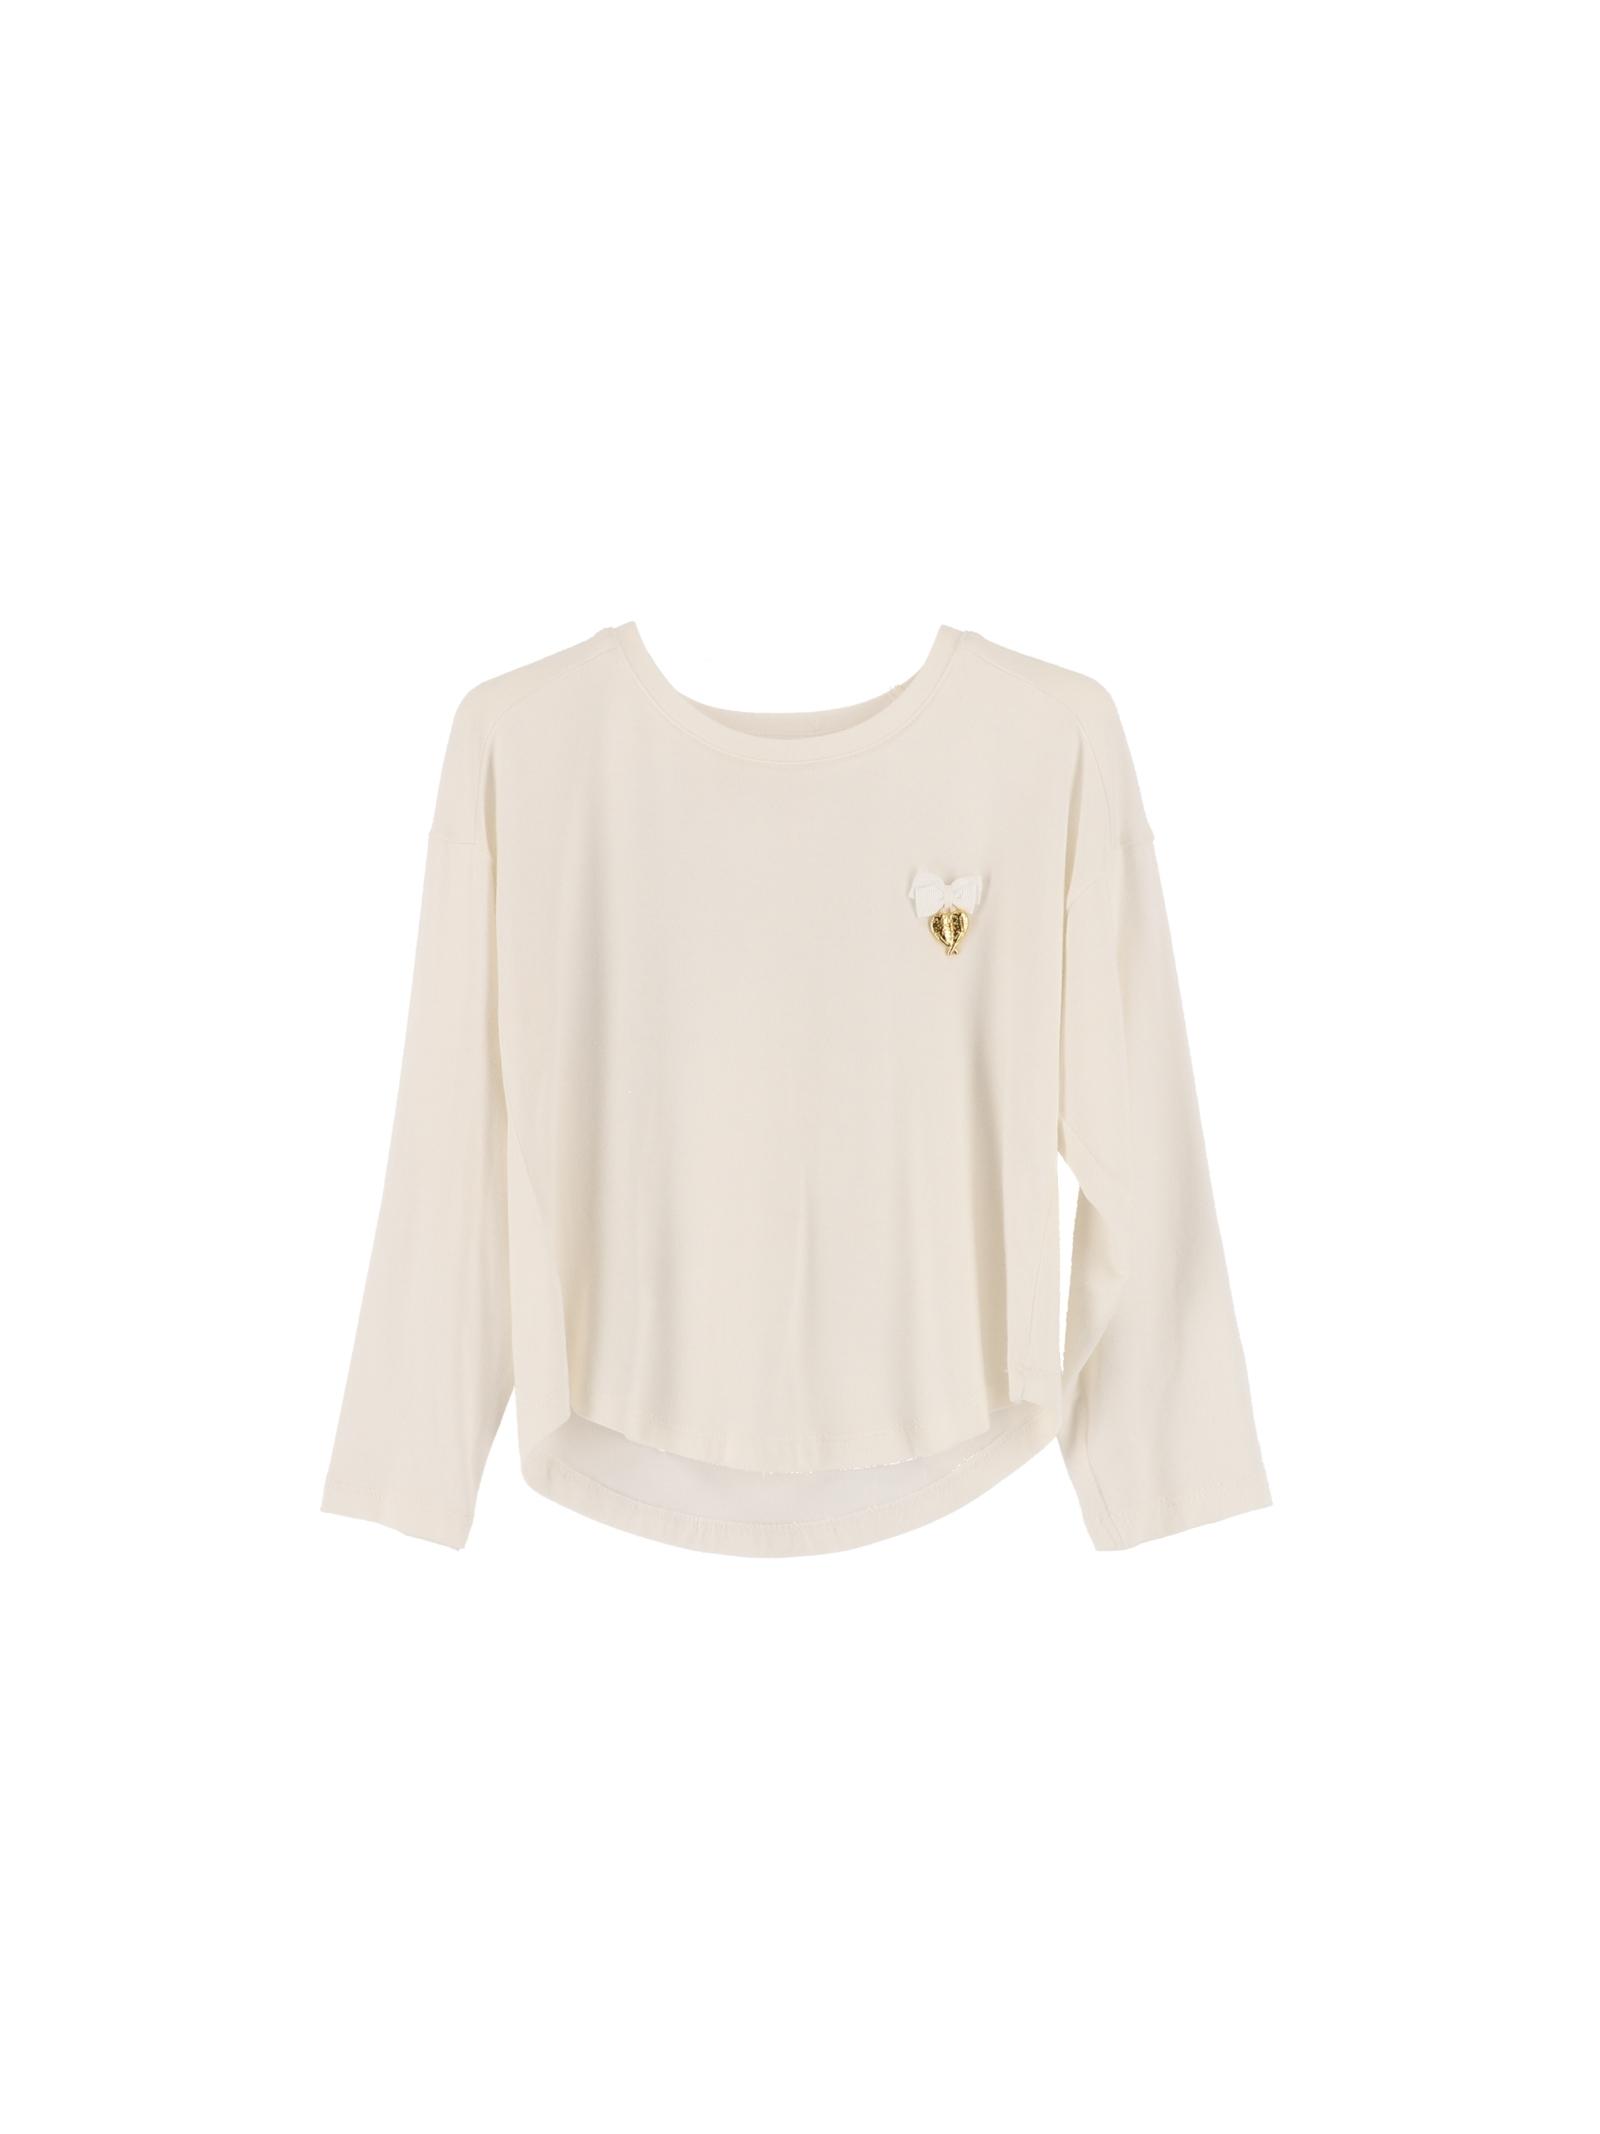 Serafina Girl Sweater ANGEL'S FACE |  | SERAFINASNOWDROP